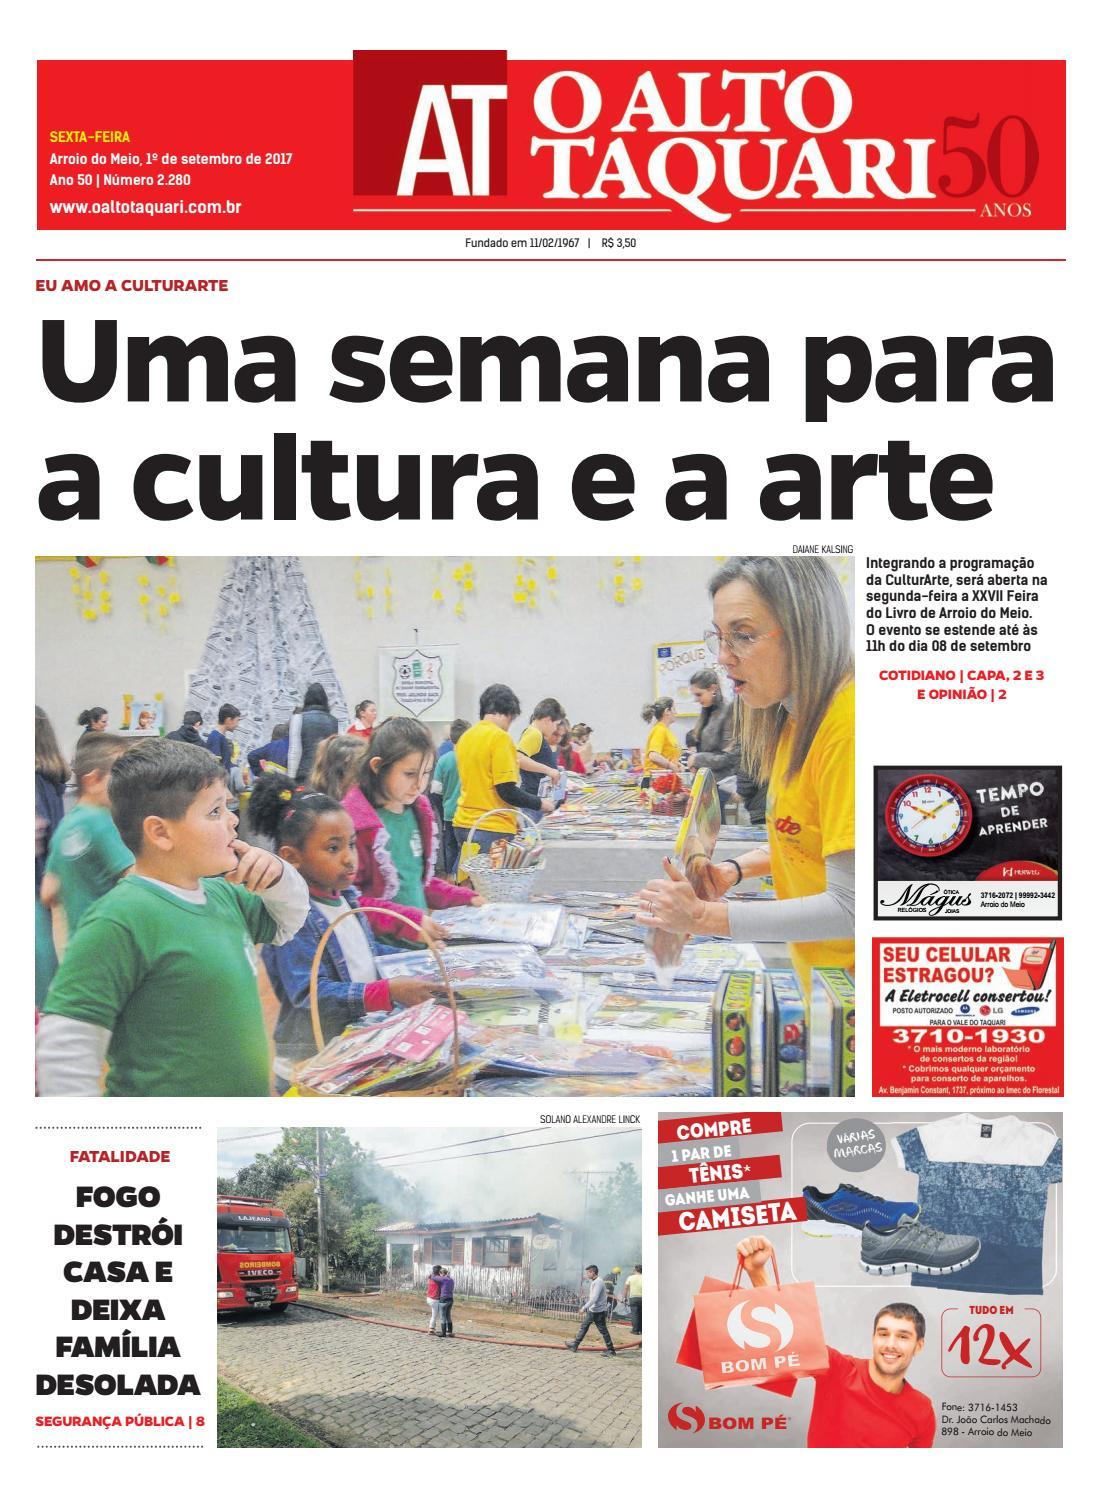 e9e02d4c8 Jornal O Alto Taquari - 1º de setembro de 2017 by Jornal O Alto Taquari -  issuu